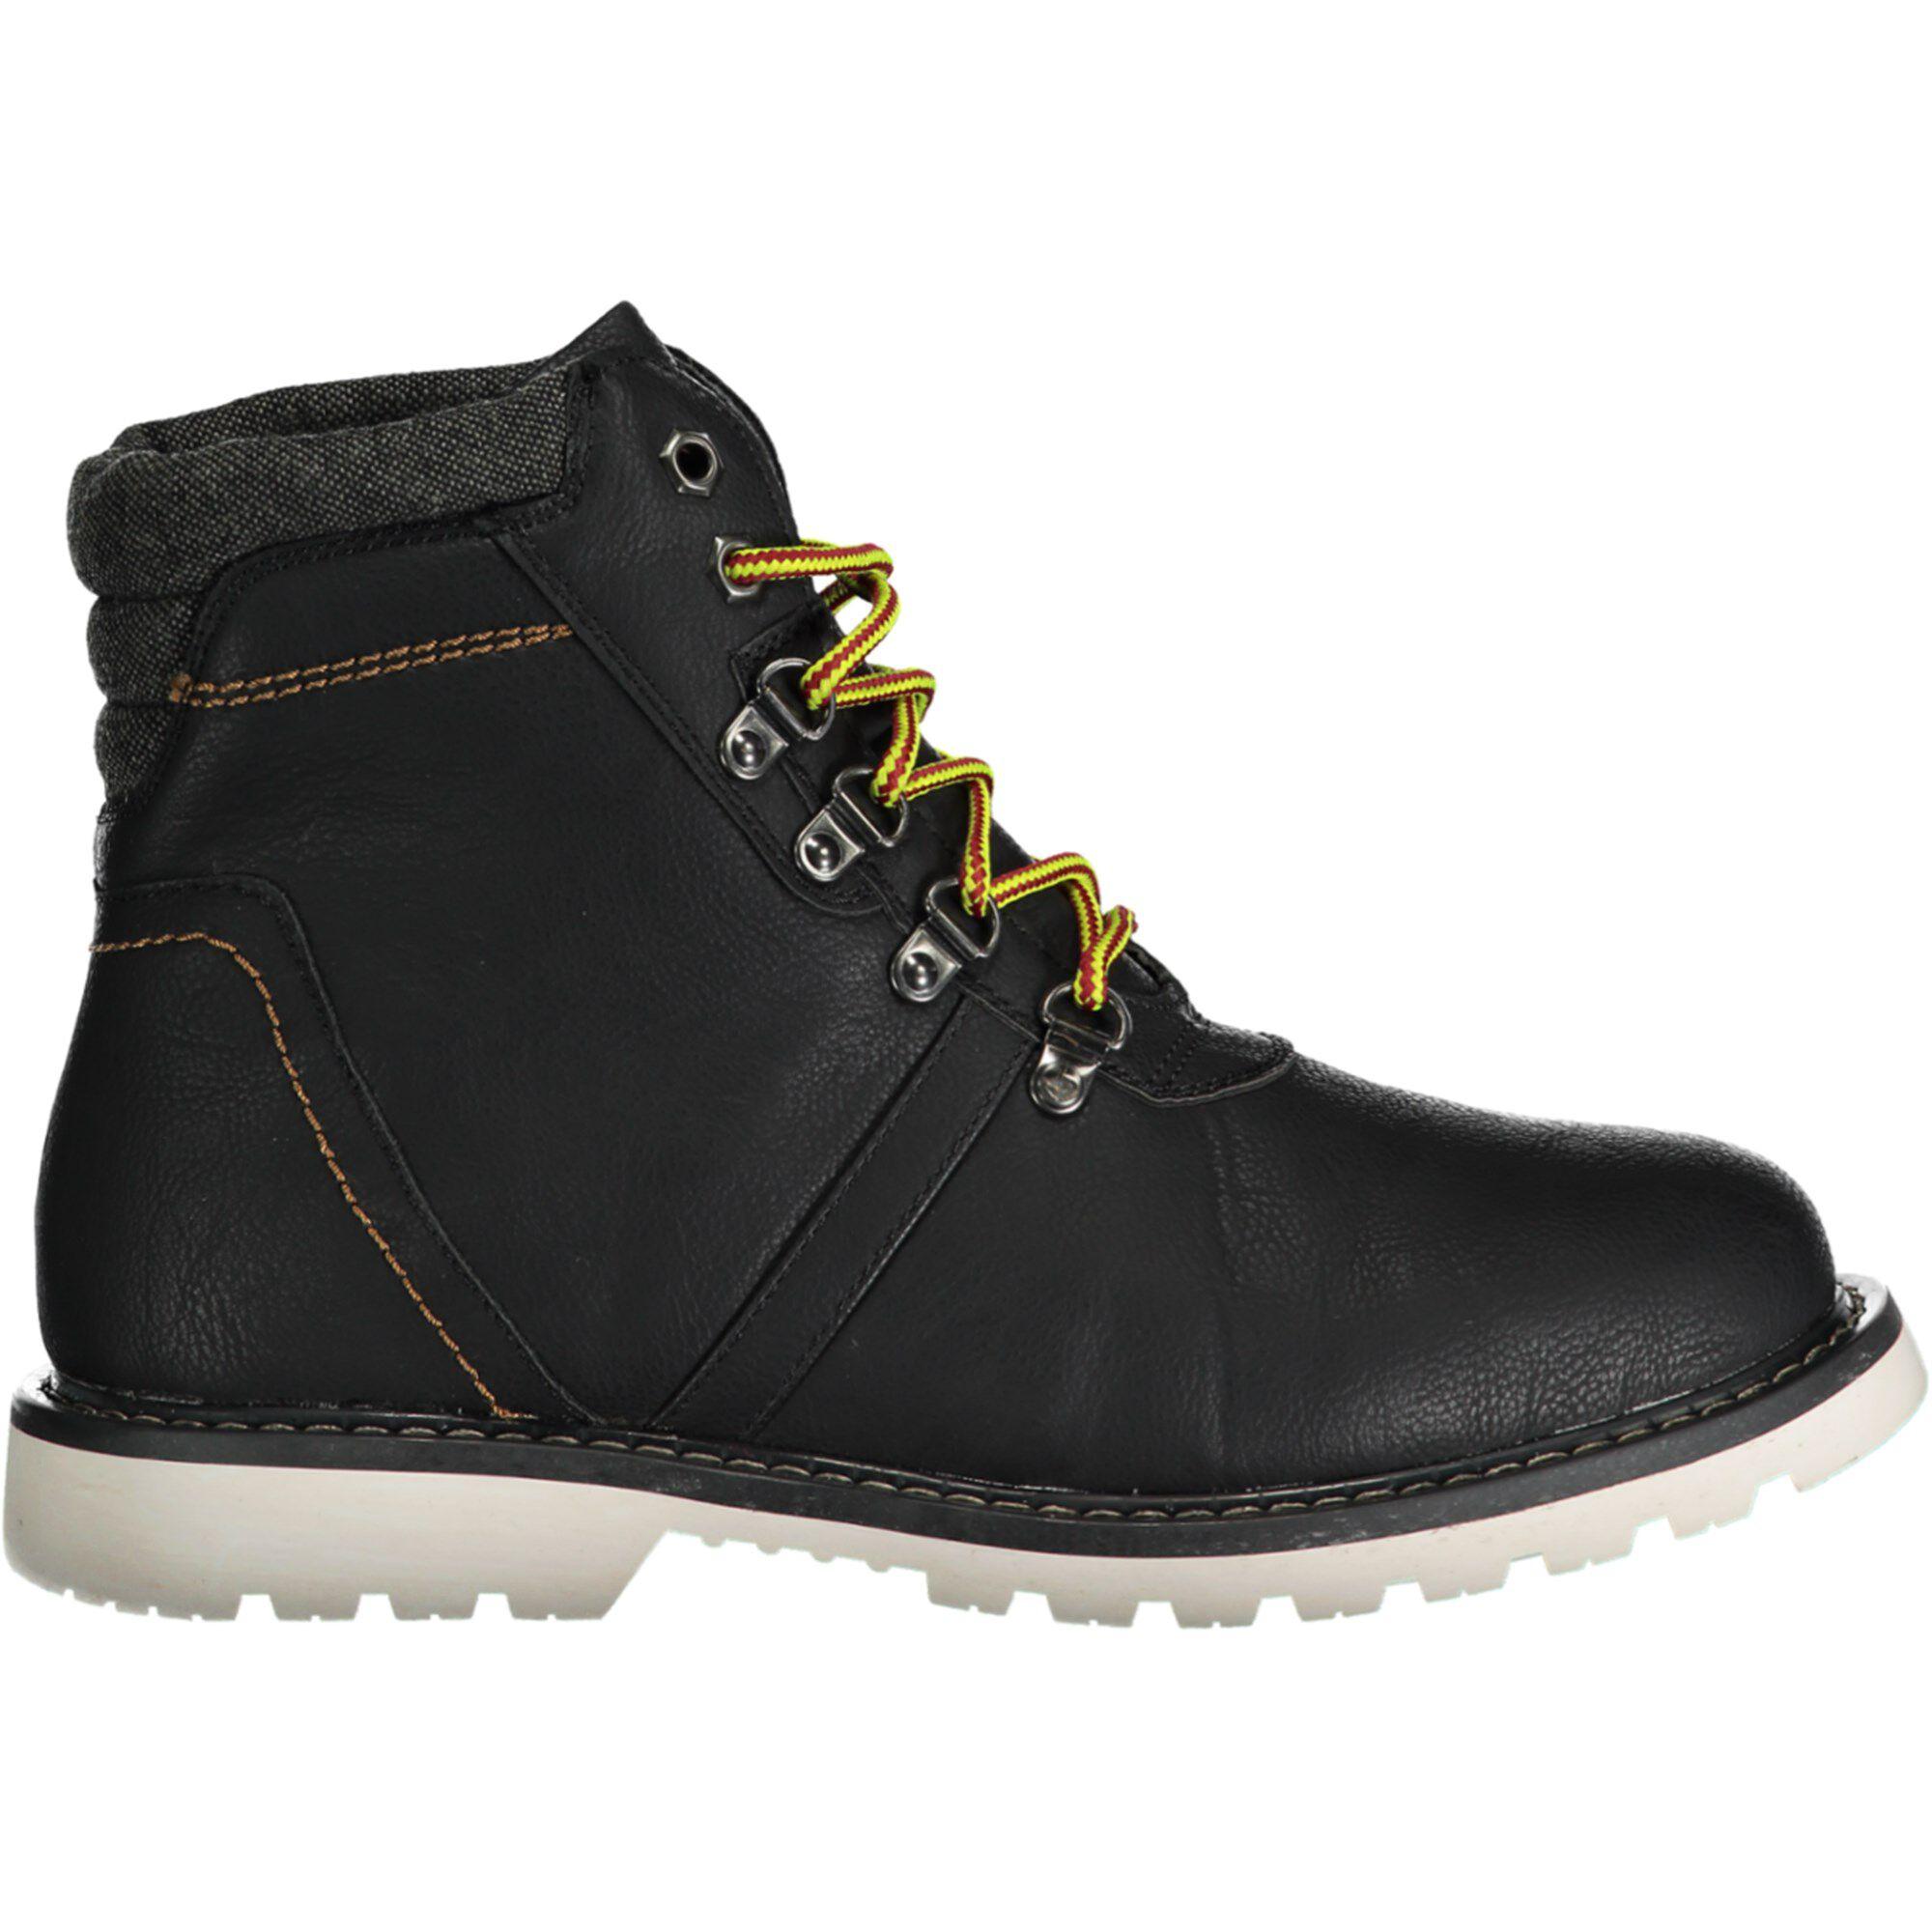 Timberland Brooklyn Hiker Black, Sko, Boots & Støvler, Vandrestøvler, Sort, Herre, 44